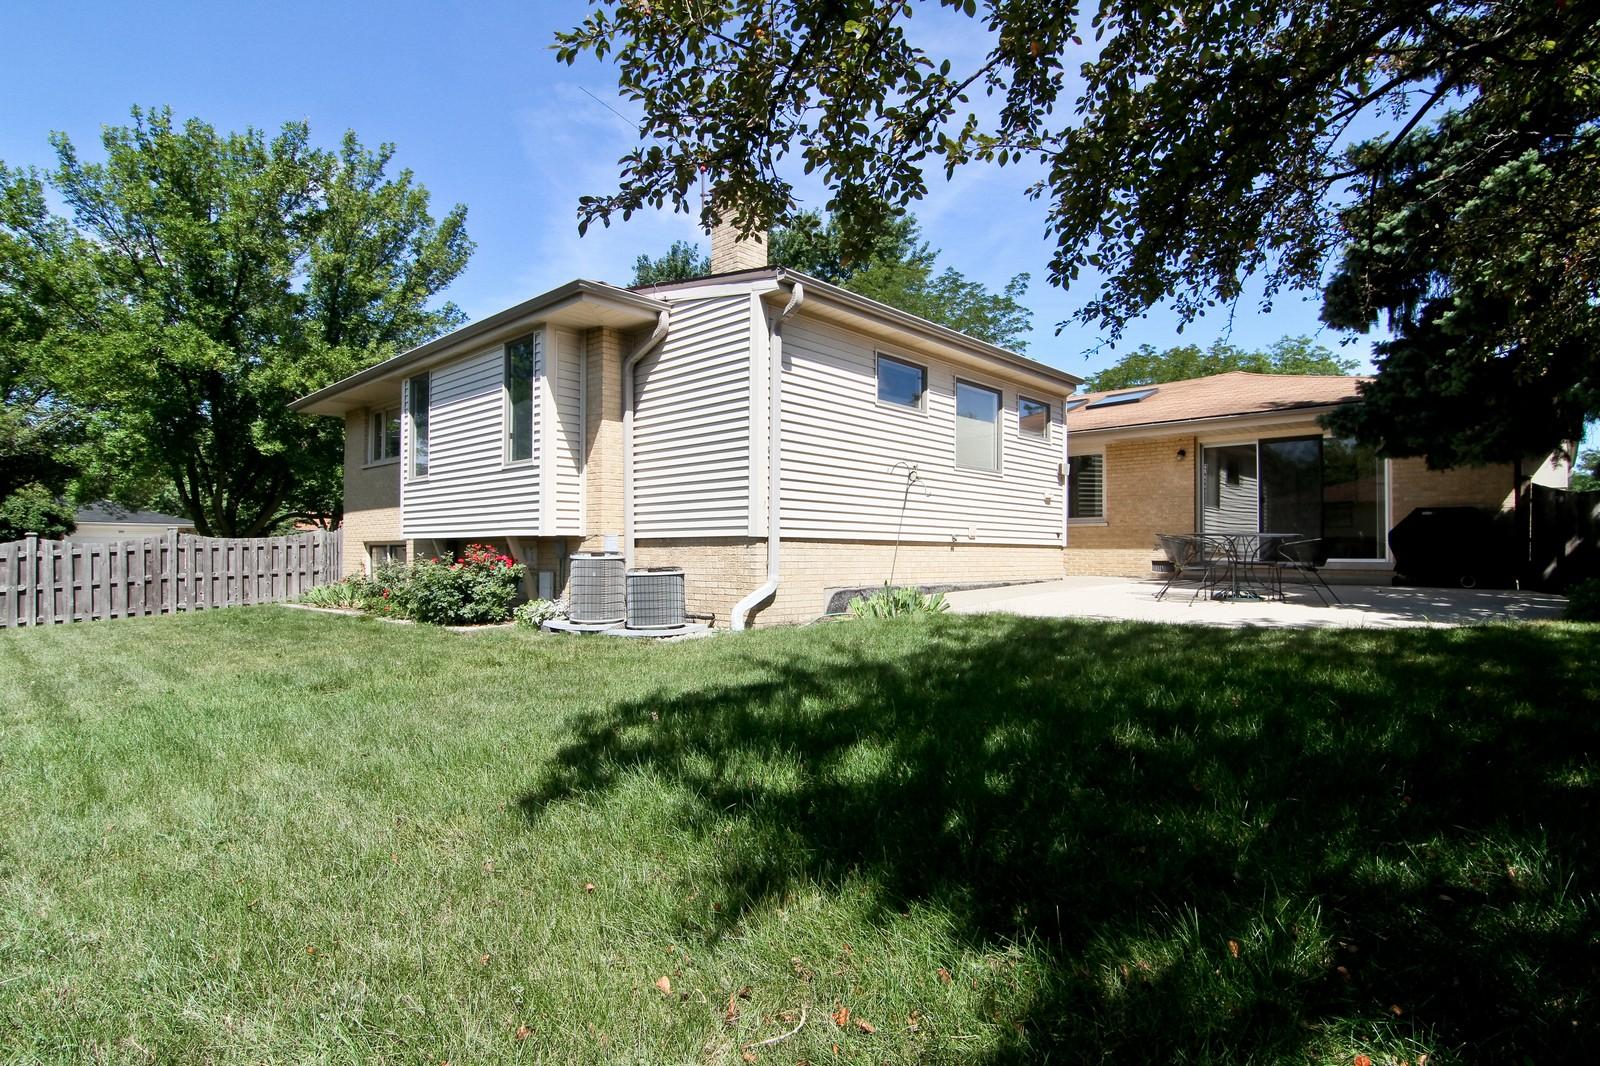 Real Estate Photography - 829 Columbia, Darien, IL, 60561 - Rear View